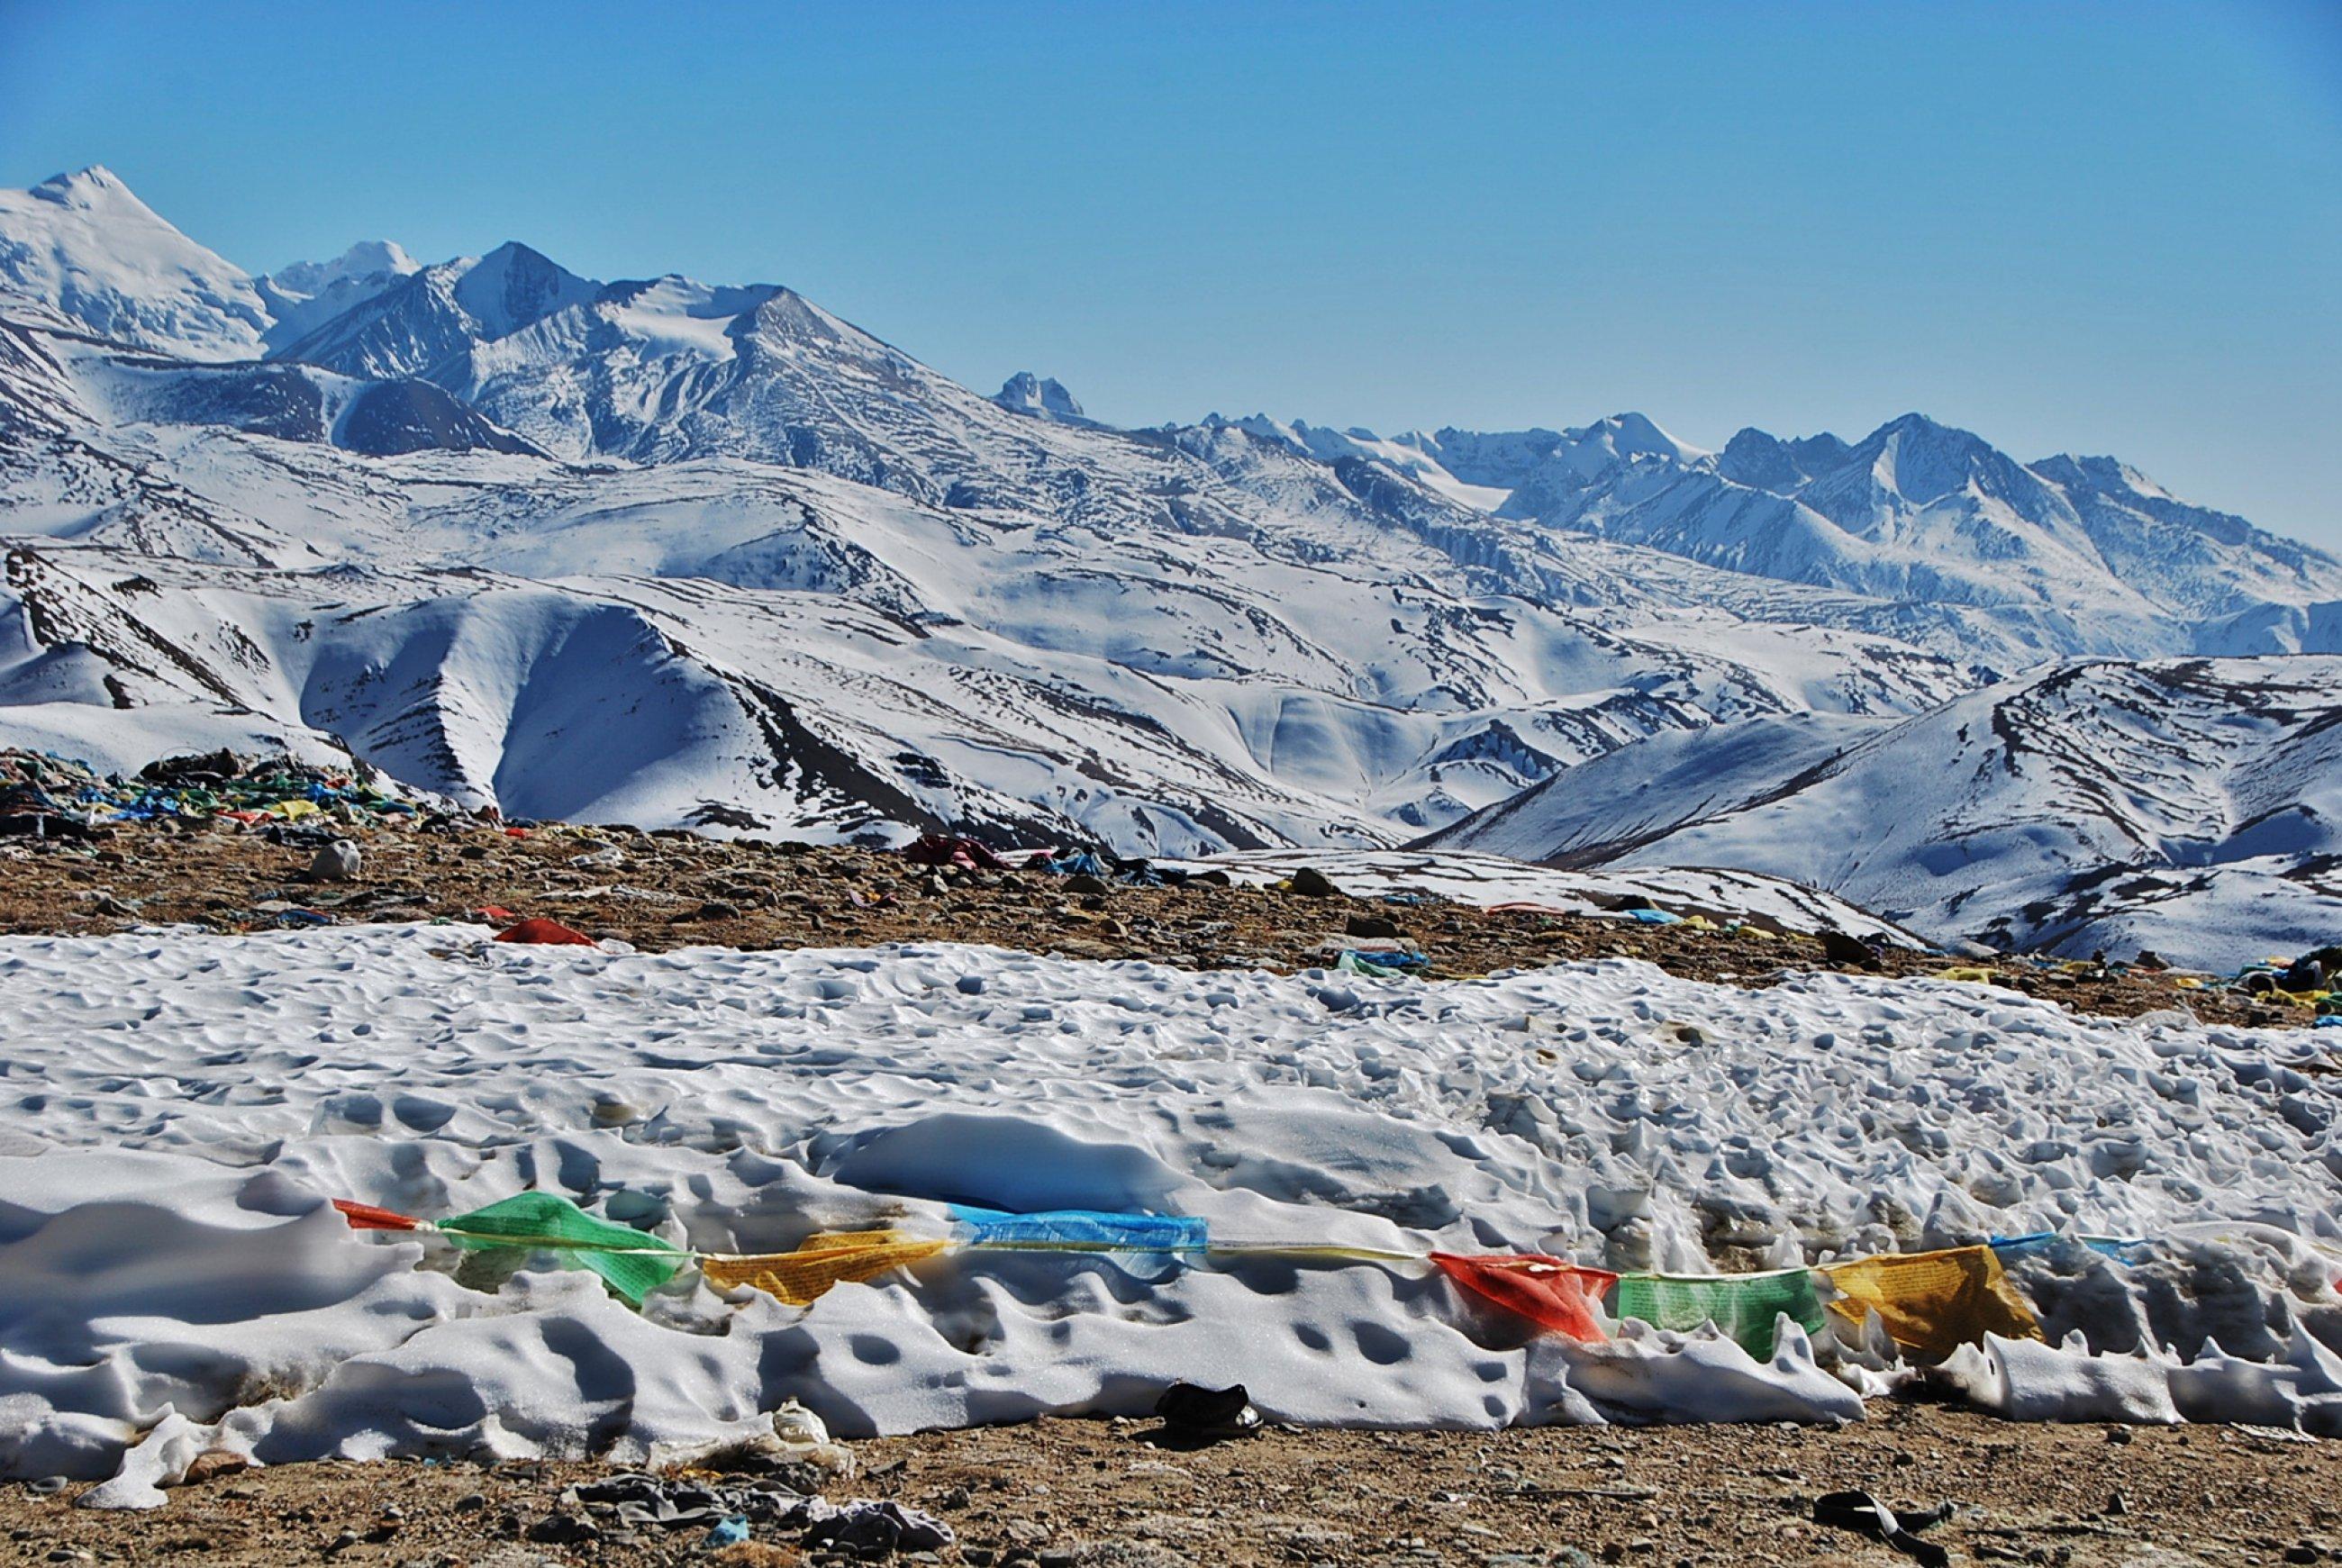 https://bubo.sk/uploads/galleries/16319/tibet-himalaje-11-2014-mirka-sulka-315-.jpg